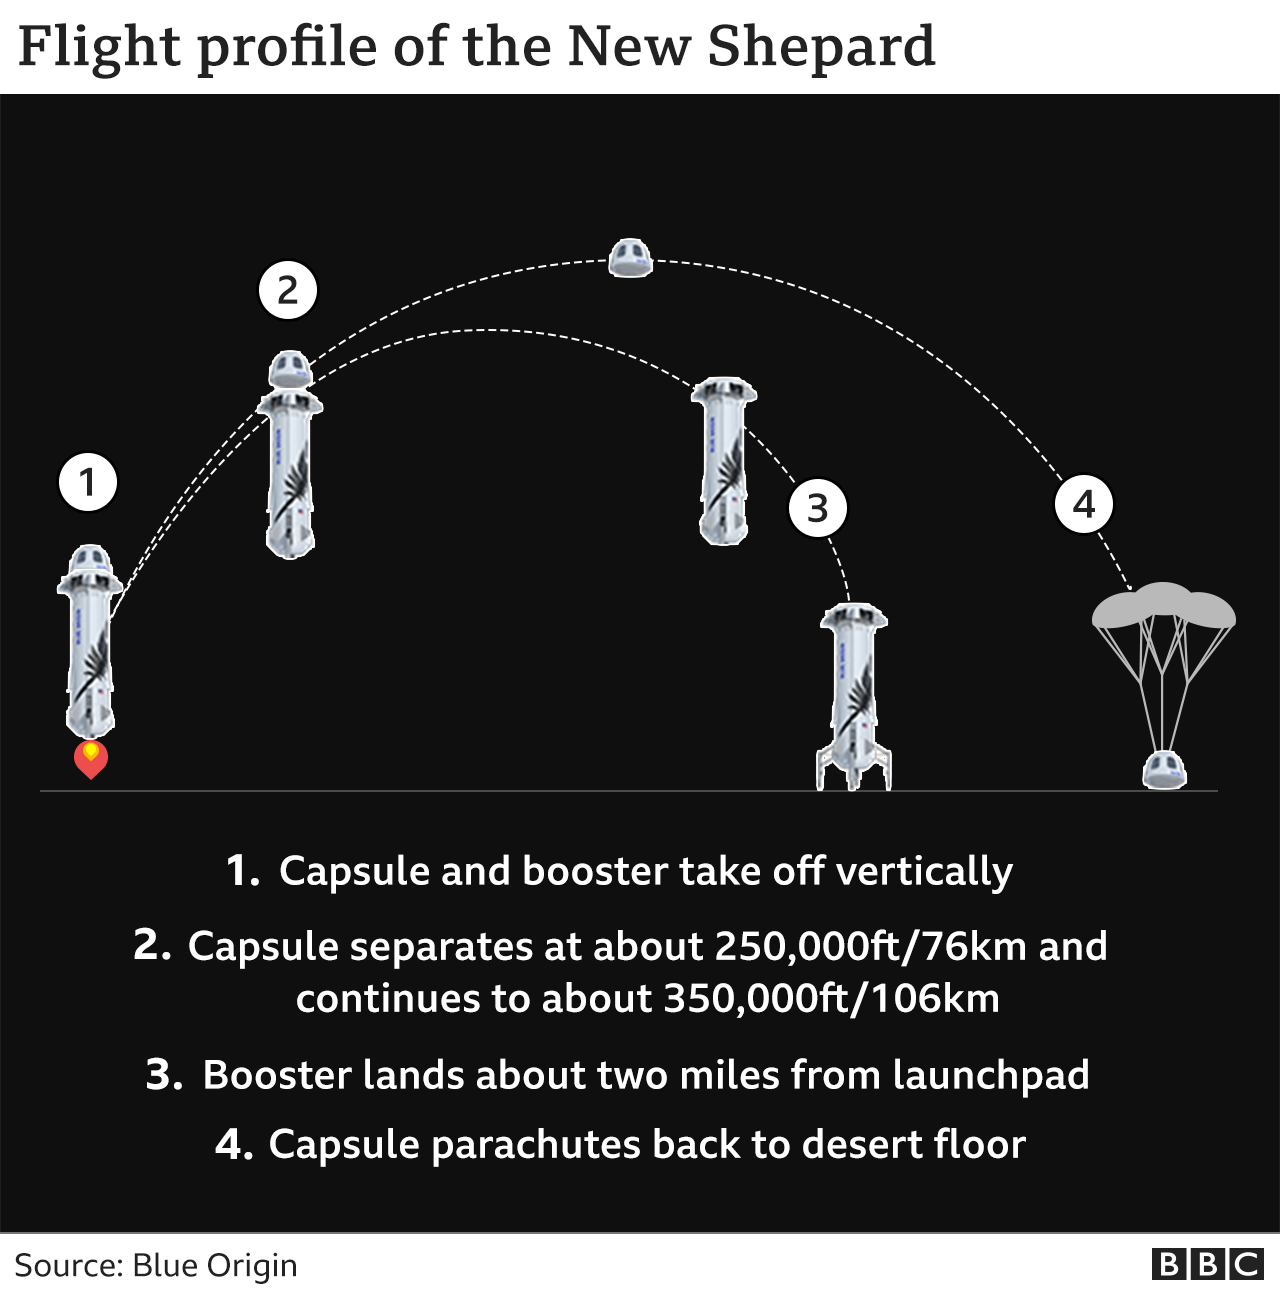 Flight profile of New Shepard